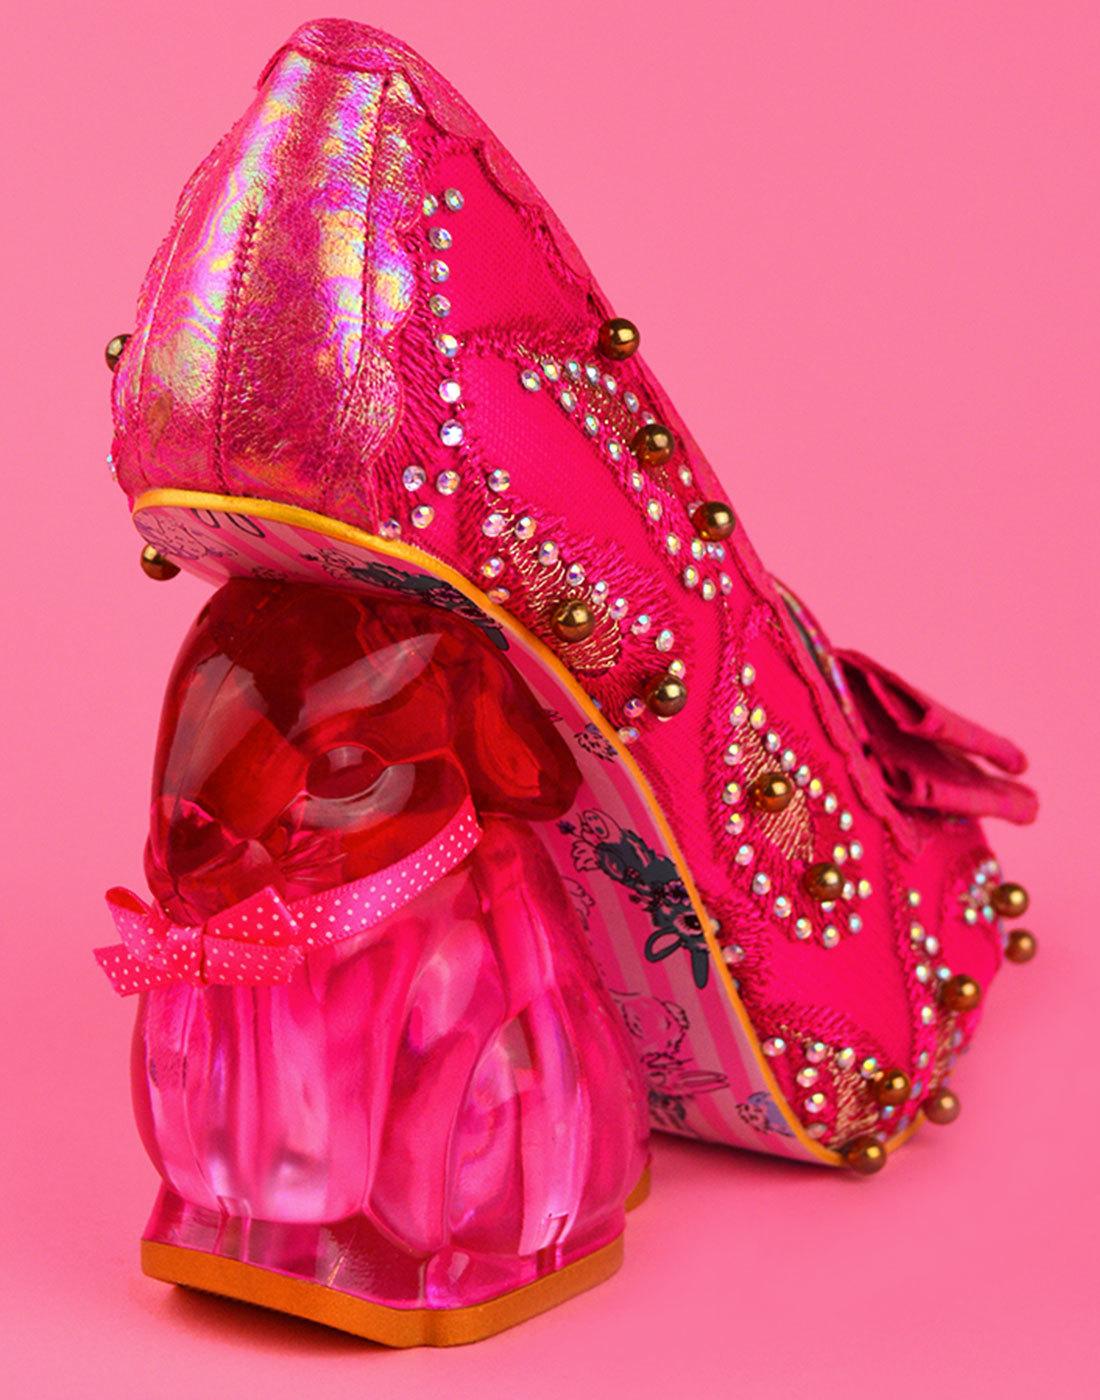 9a3af1942fb IRREGULAR CHOICE Hoppity Limited Edition Pink Bunny Heel Shoes